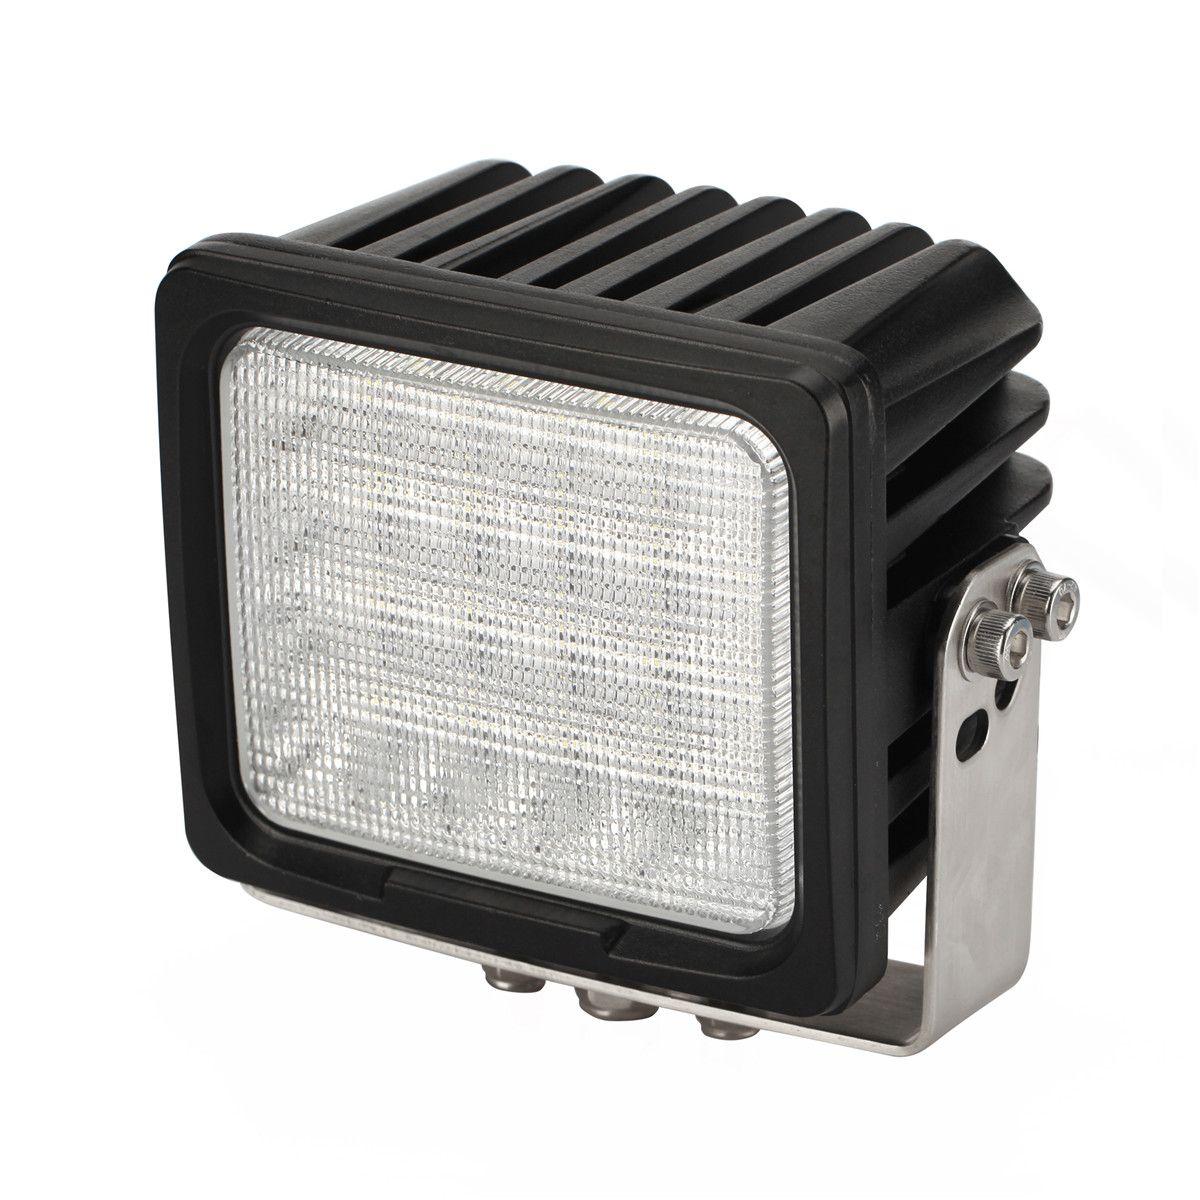 "DHL 6"" 100W 20LED*5W CREE Chips LED Driving Work Light Square Offroad SUV ATV 4WD 4x4 Spot Penc / Flood Beam 9-30V 10000lm Super Bright"